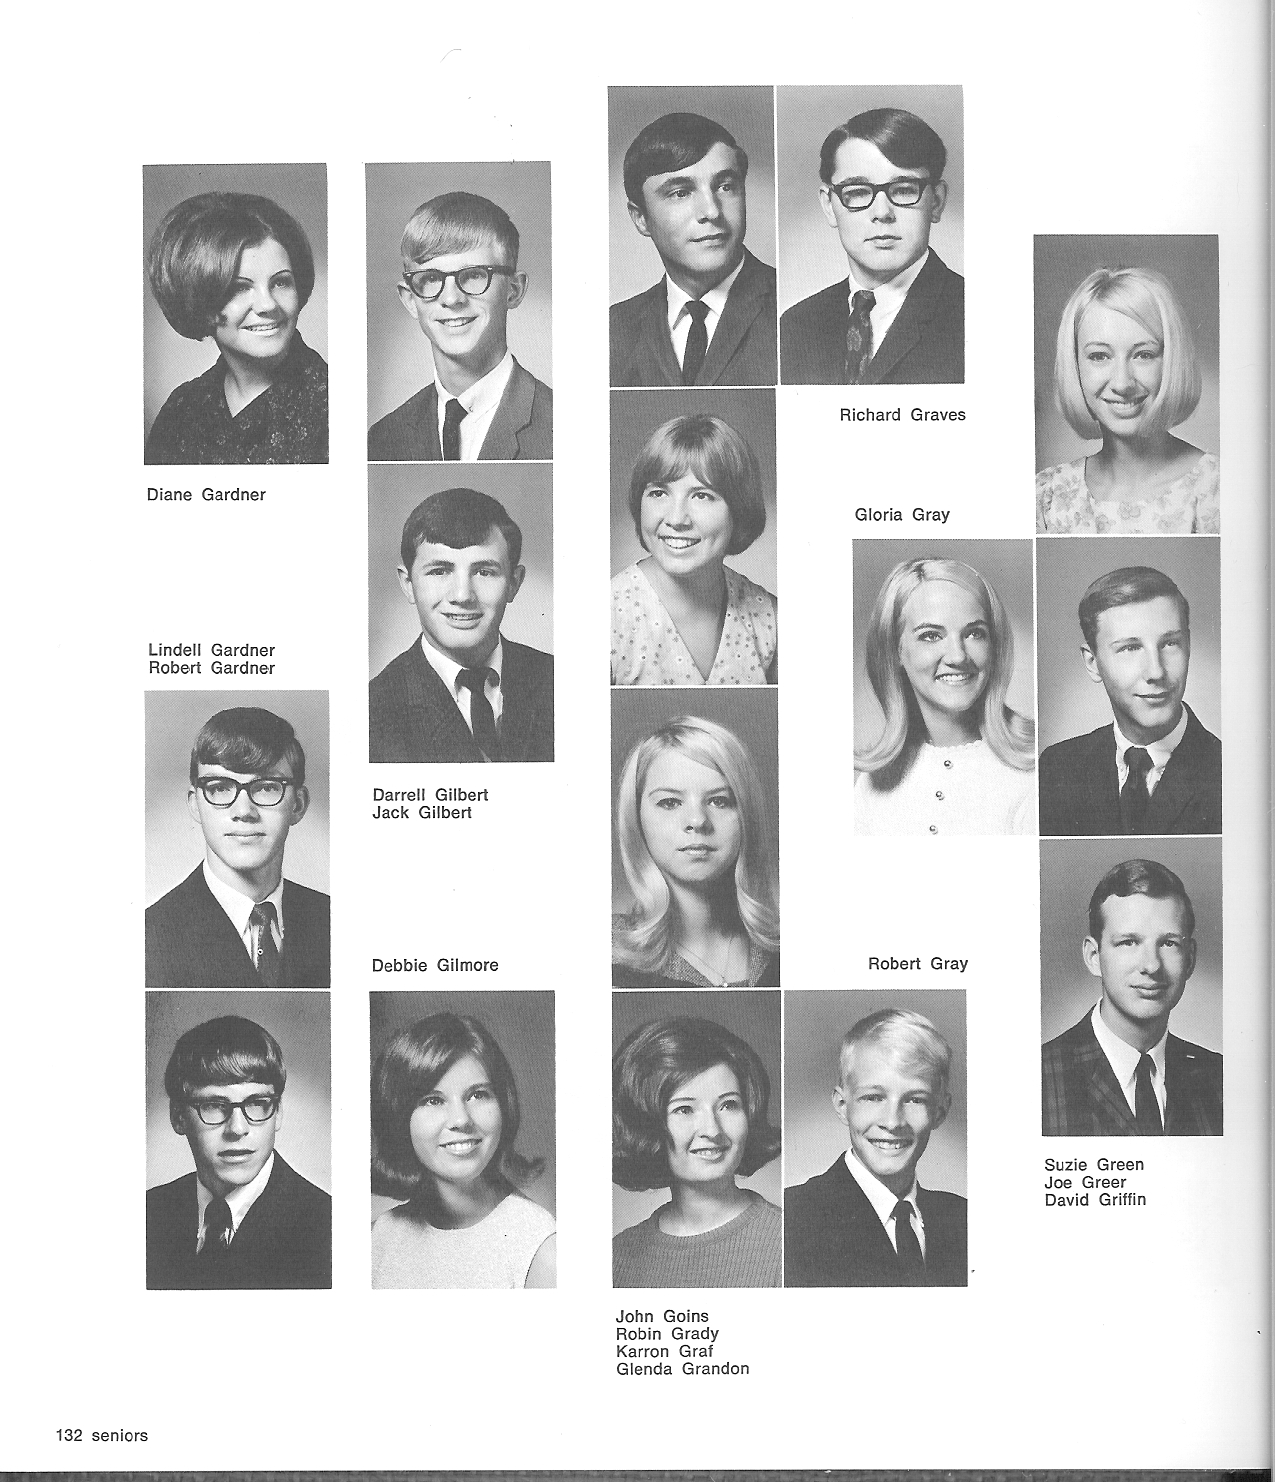 68-132